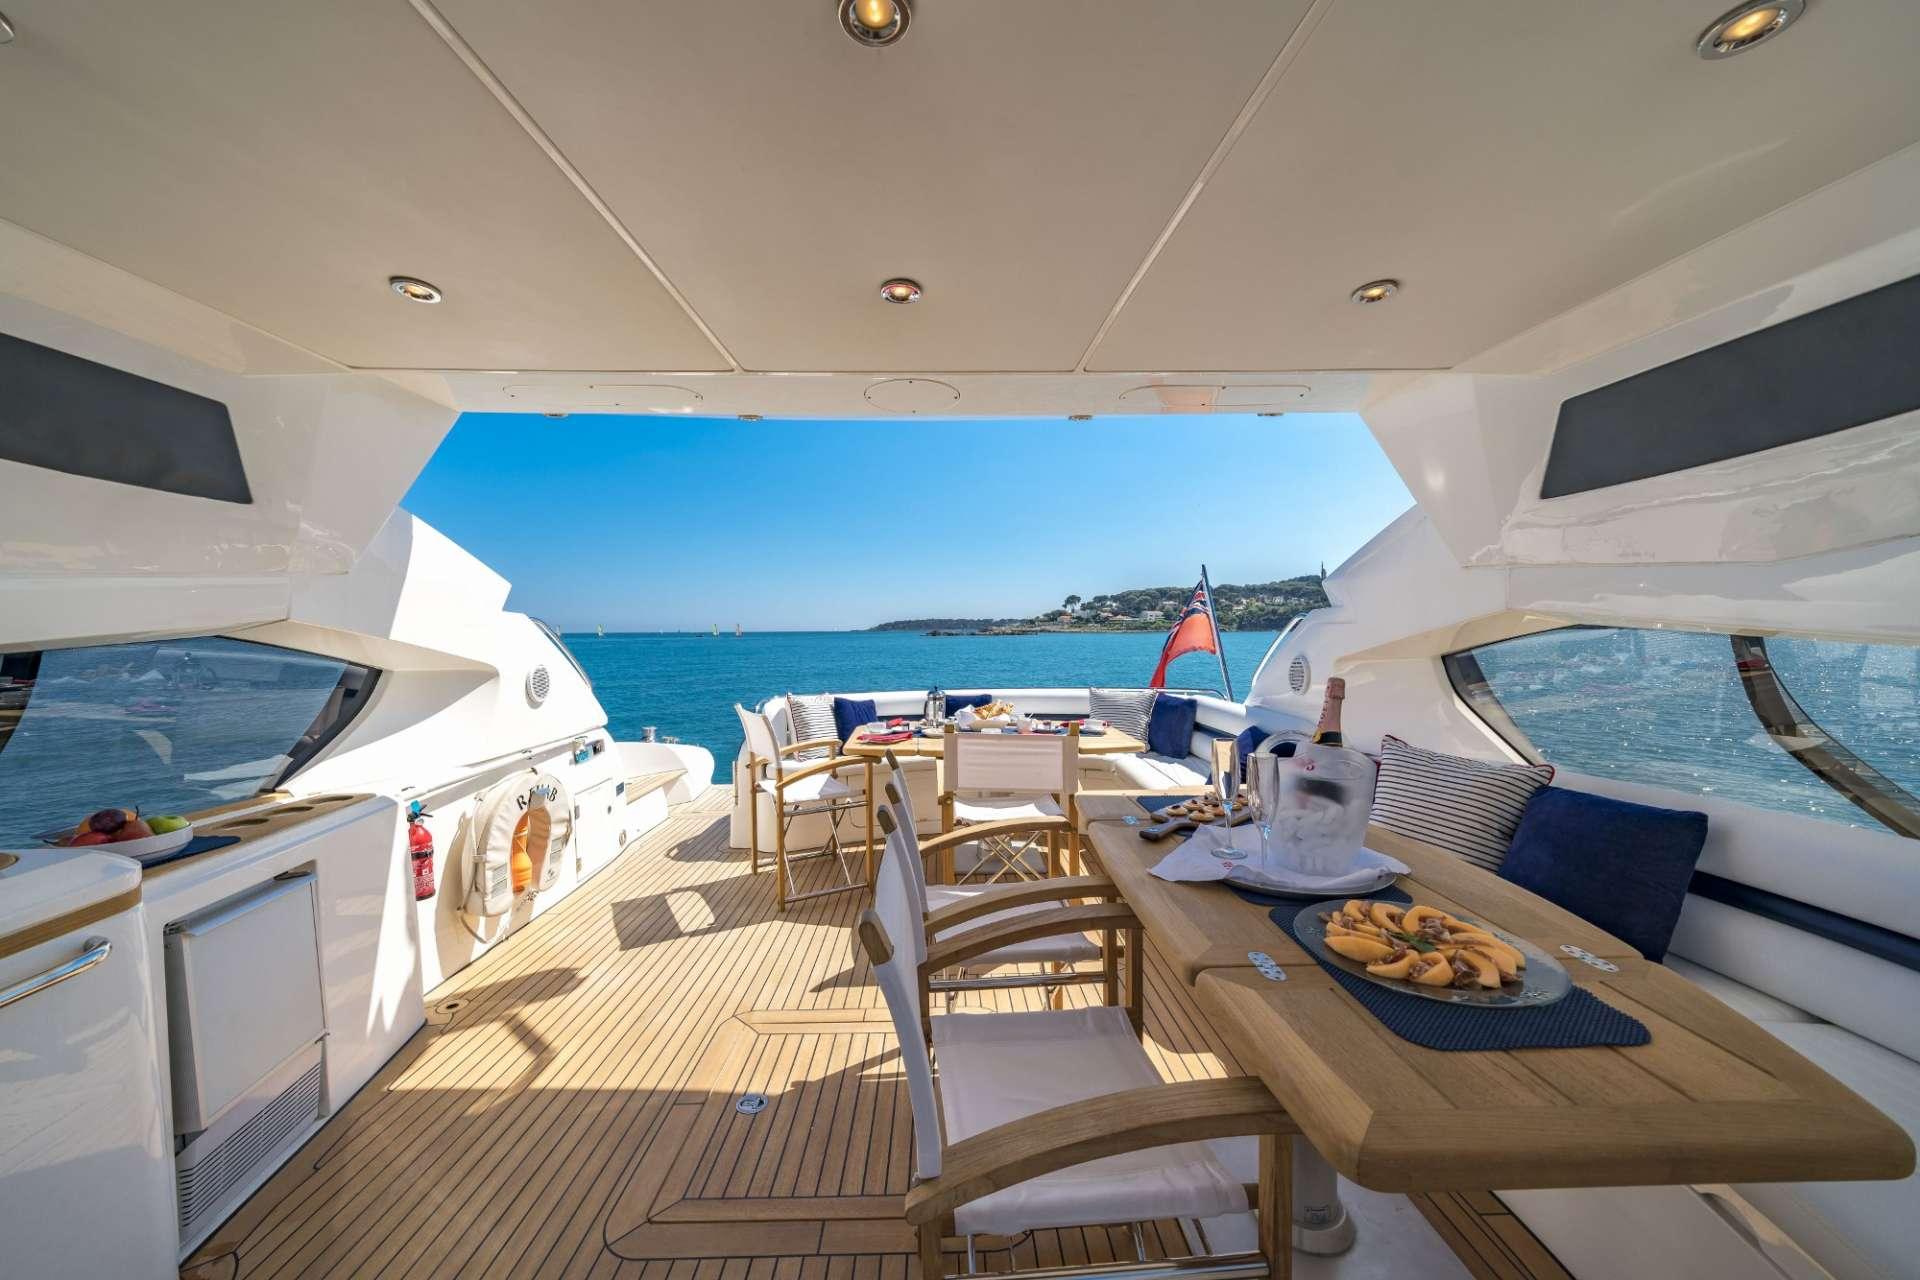 Power Yacht 'Power', 4 PAX, 2 Crew, 68.00 Ft, 21.00 Meters, Built 2004, Sunseeker, Refit Year